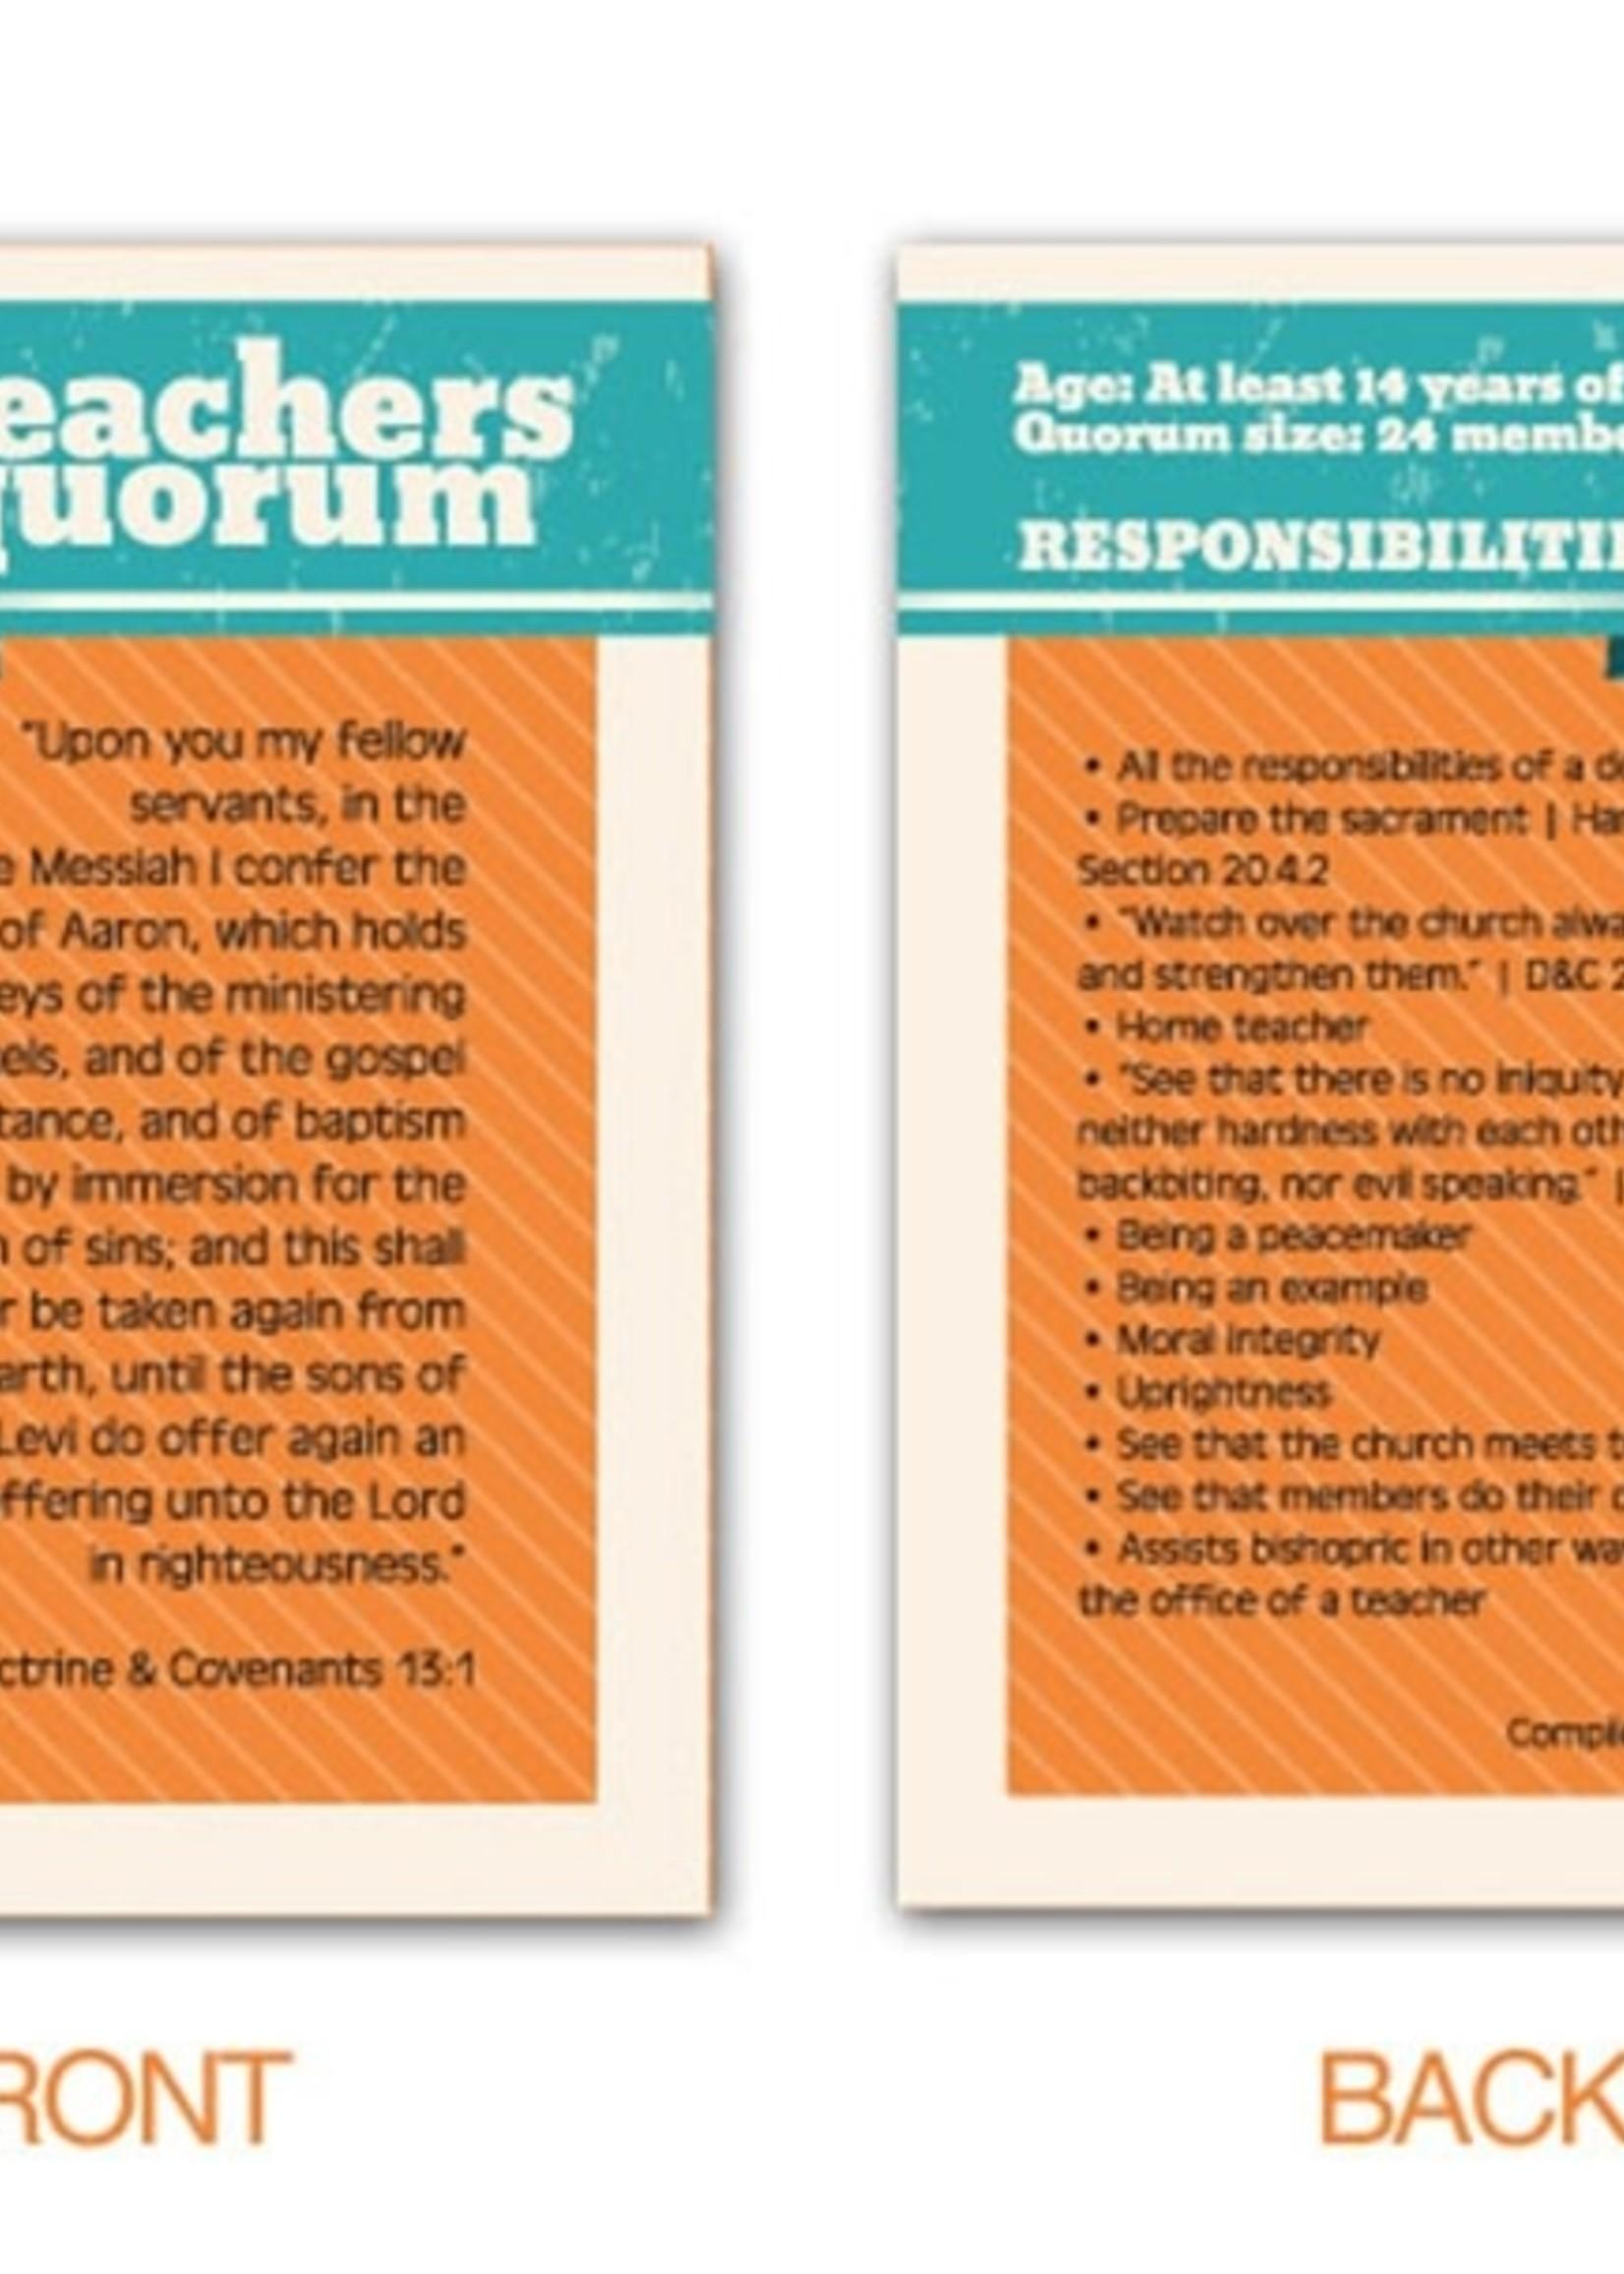 TEACHERS QUORUM POCKET CARDS